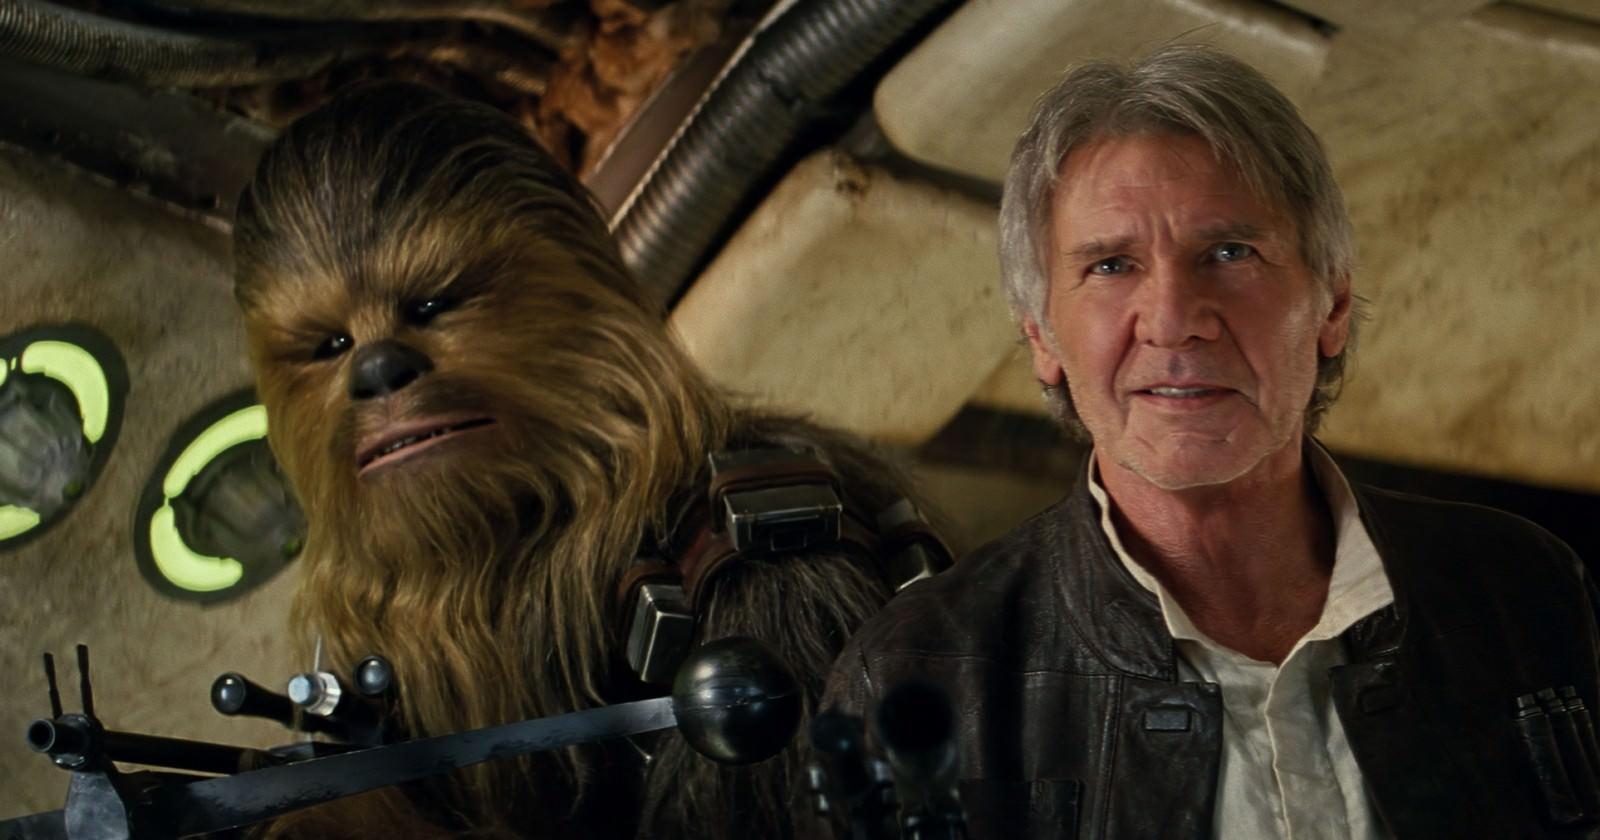 Movie, Star Wars: The Force Awakens(美國, 2015) / STAR WARS:原力覺醒(台灣) / 星球大战:原力觉醒(中國) / 星球大戰:原力覺醒(香港), 電影劇照